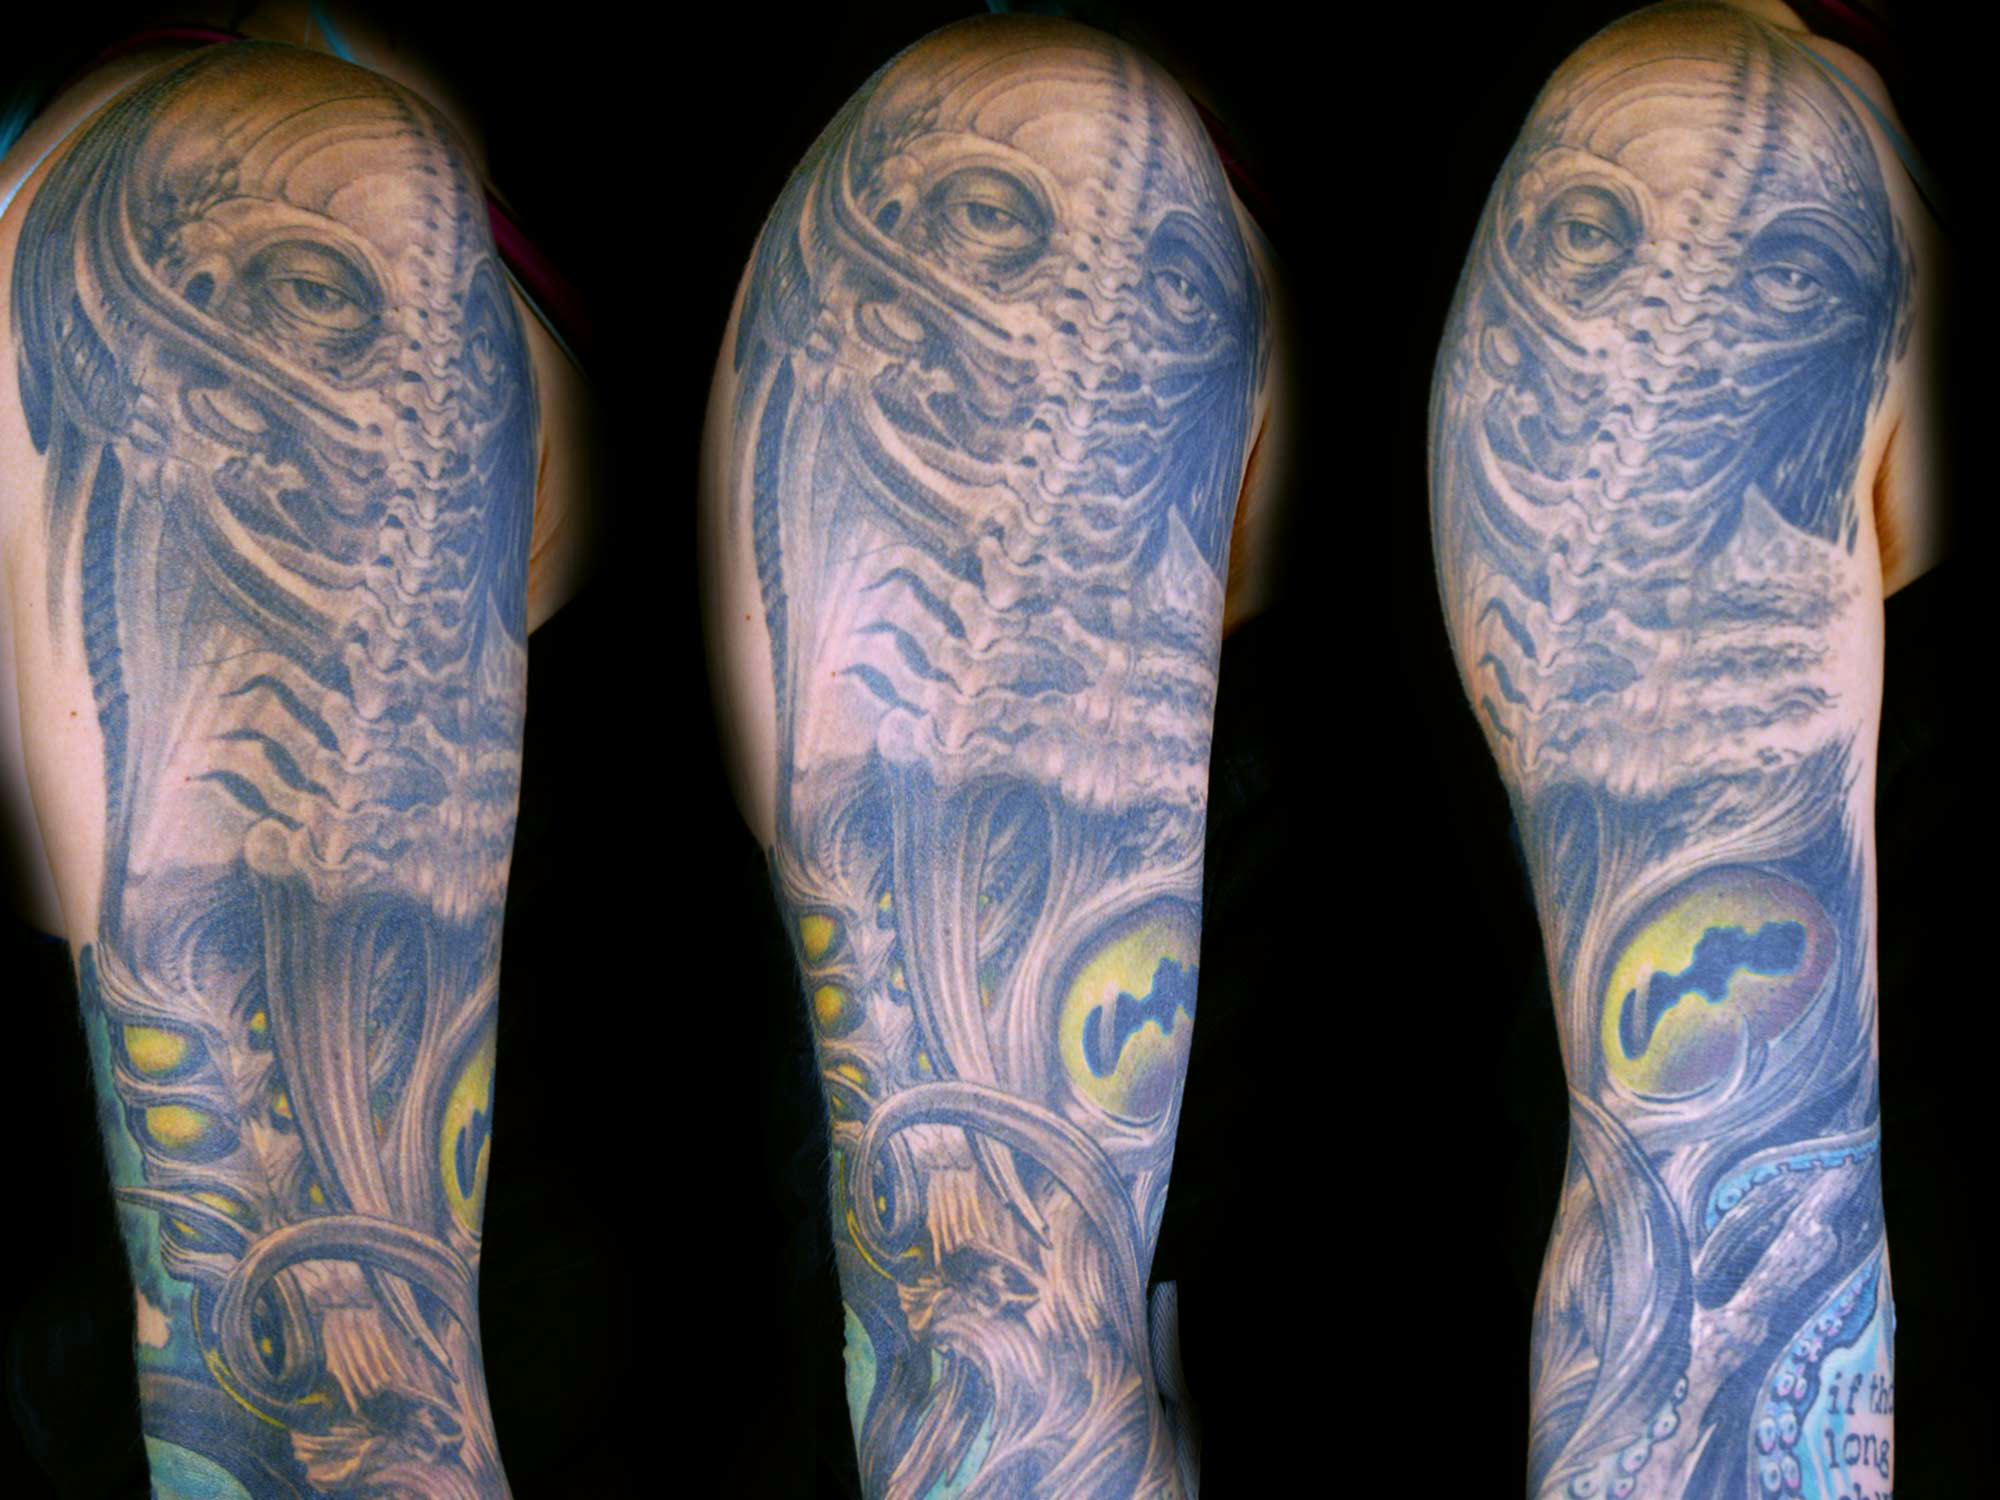 Biomechanik-Krake-Giger-Alien Hits for  Life Shit for life it for life tattoo Raul München Munich